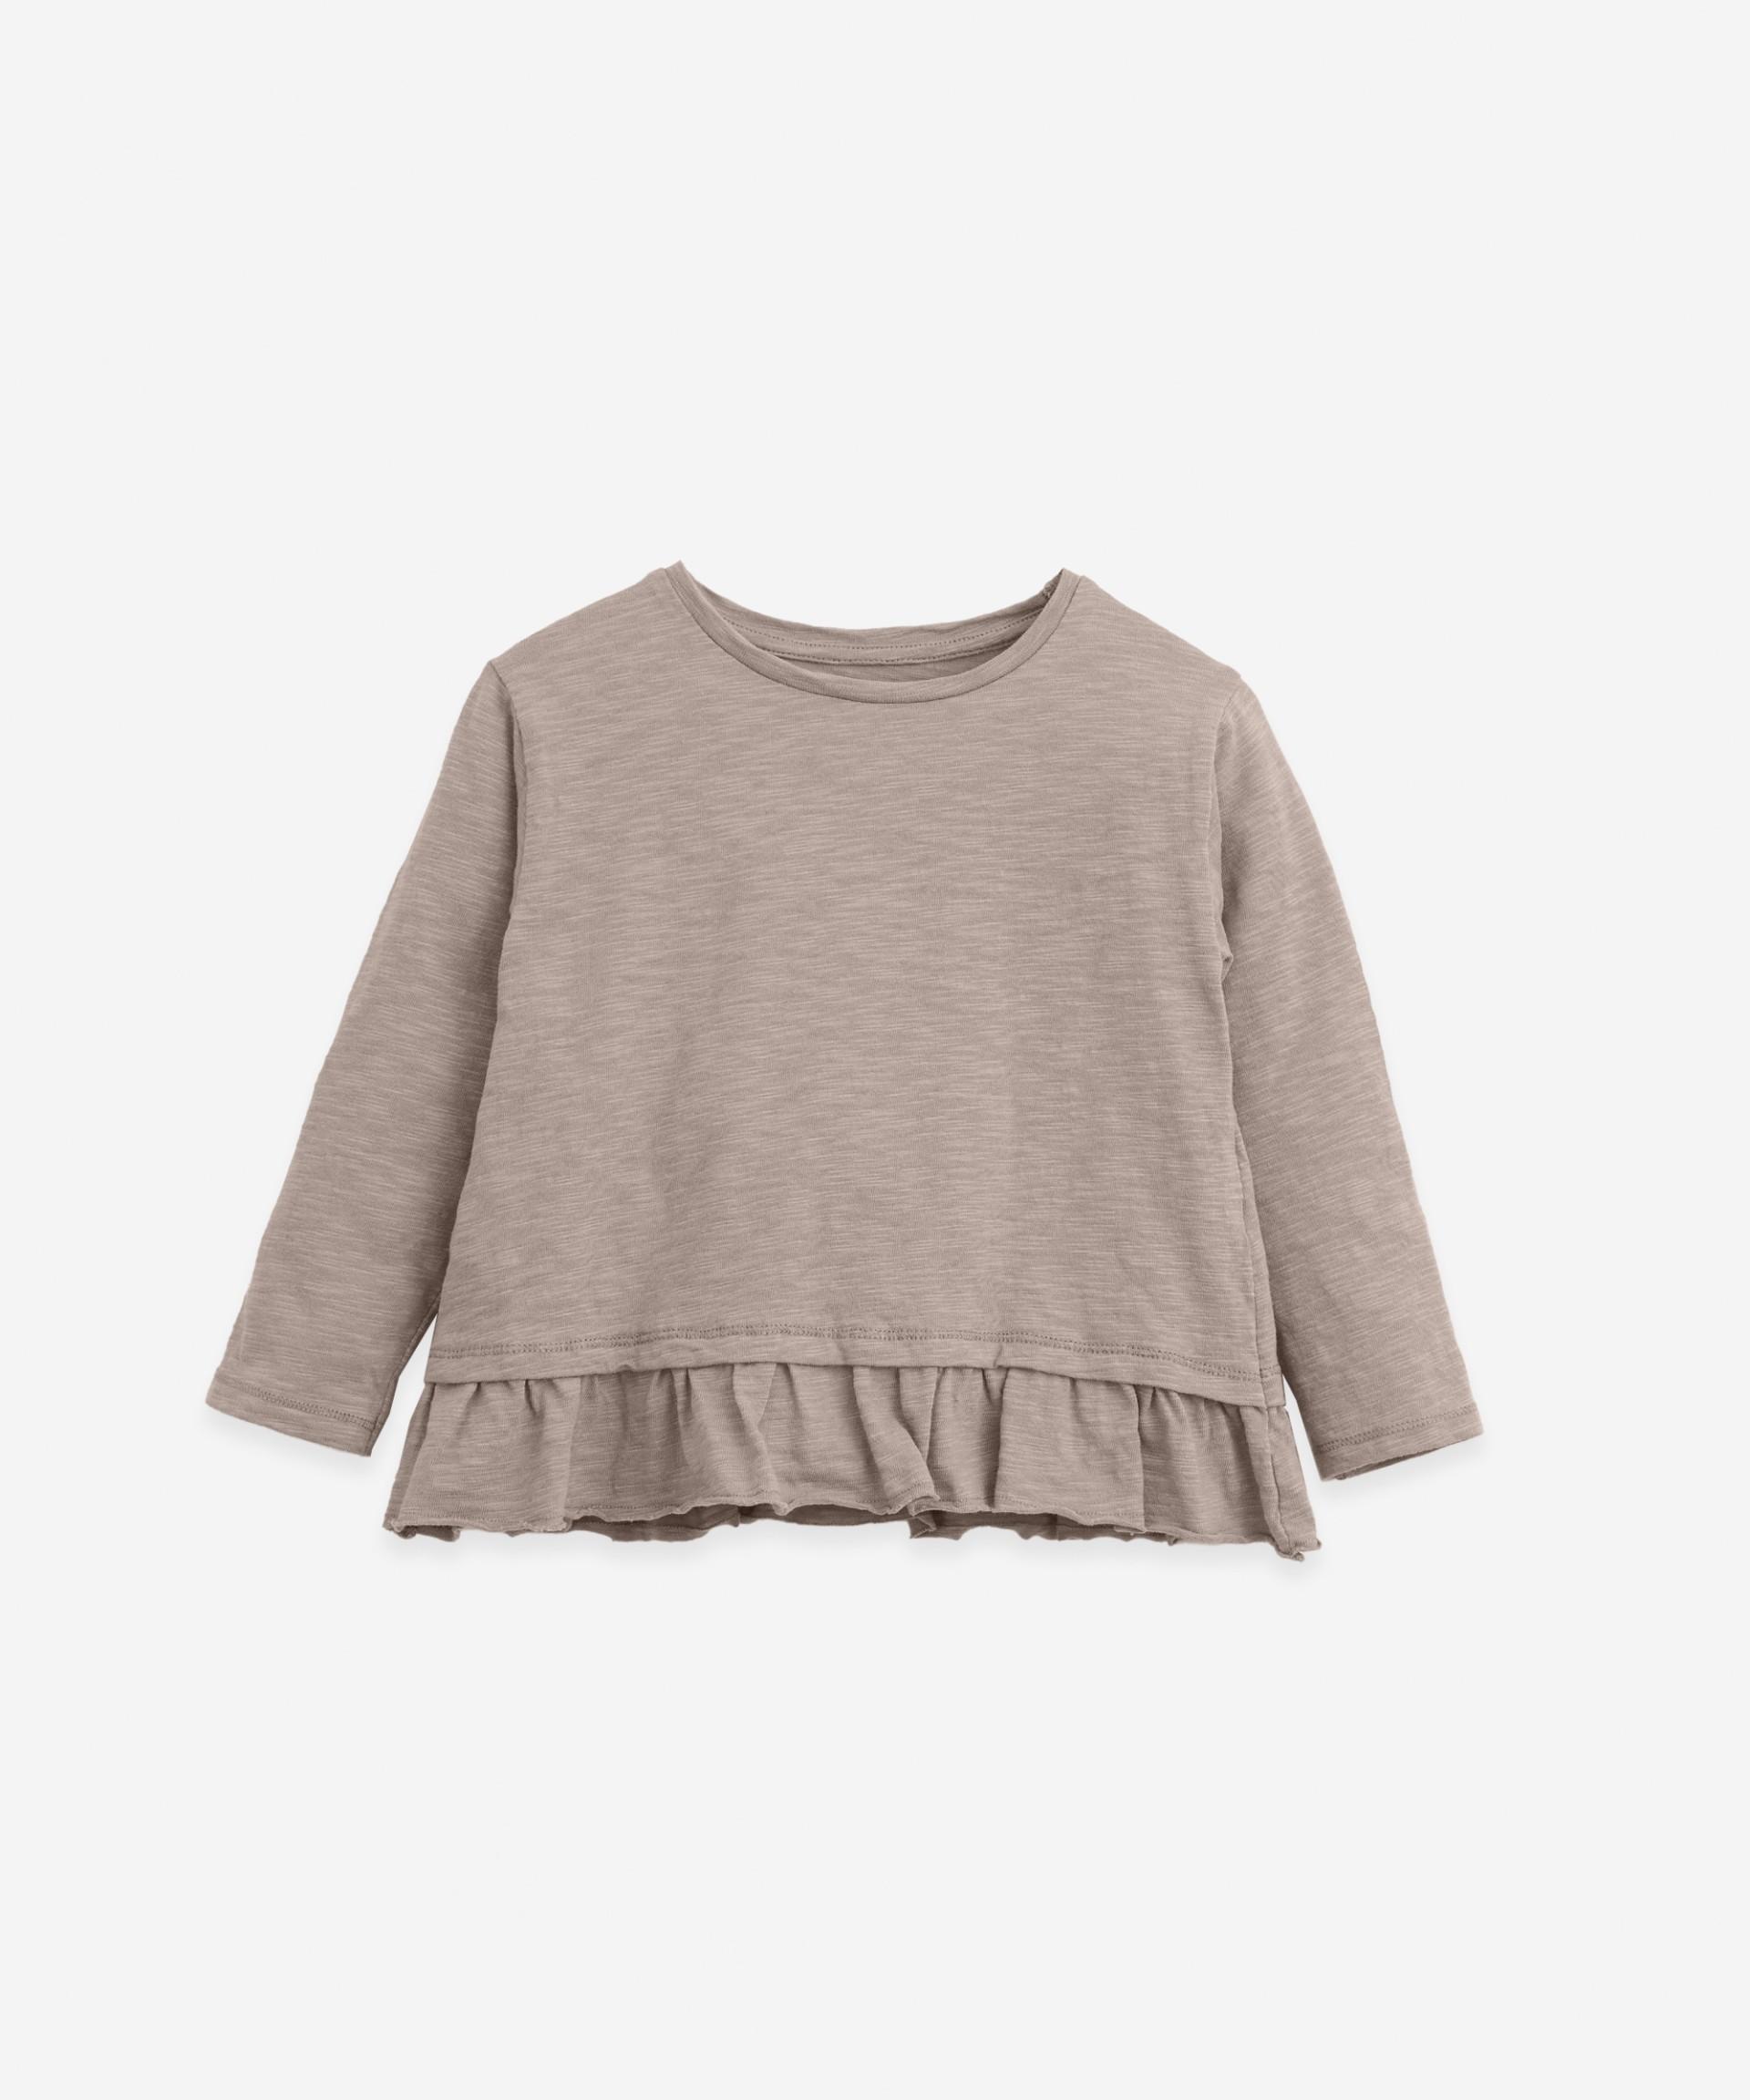 Long-sleeved T-shirt | Botany